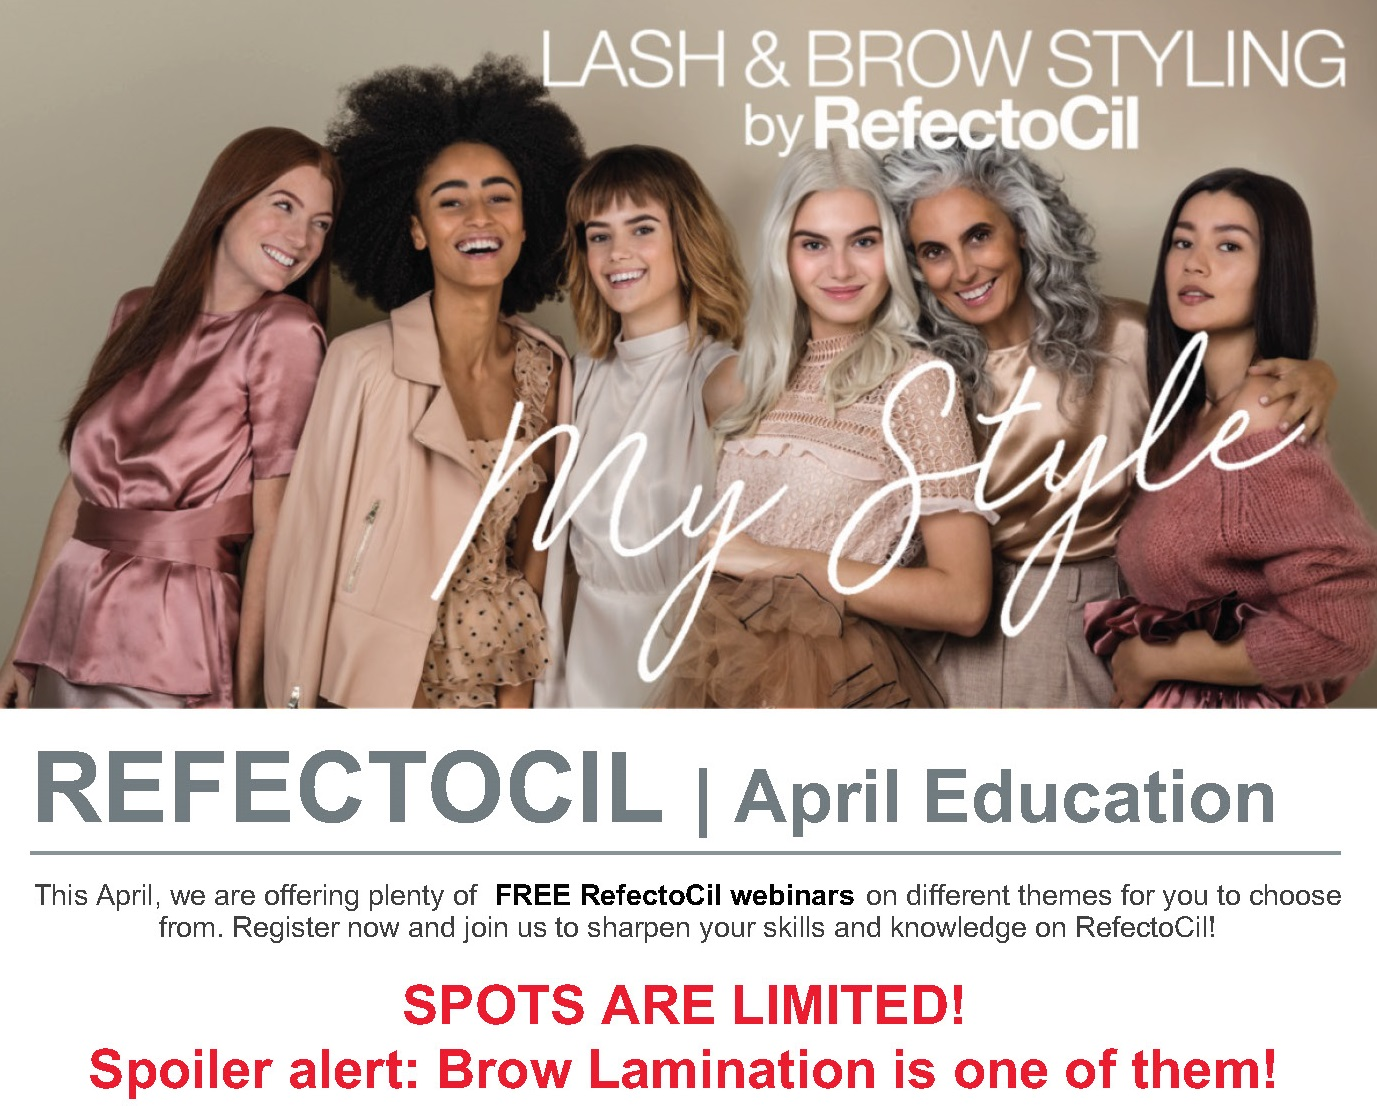 refectocil-april-webinars-2020-4.jpg